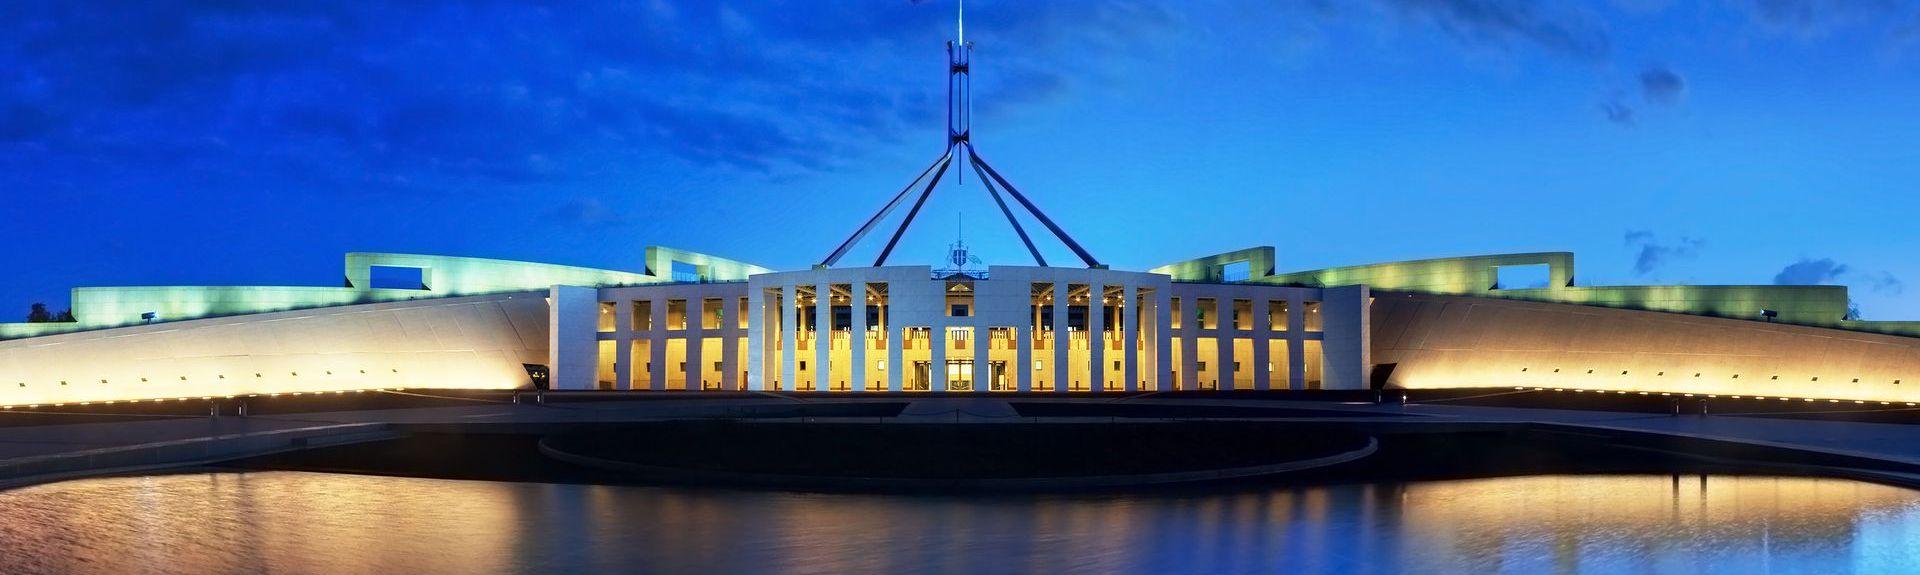 Page, ACT, Australia